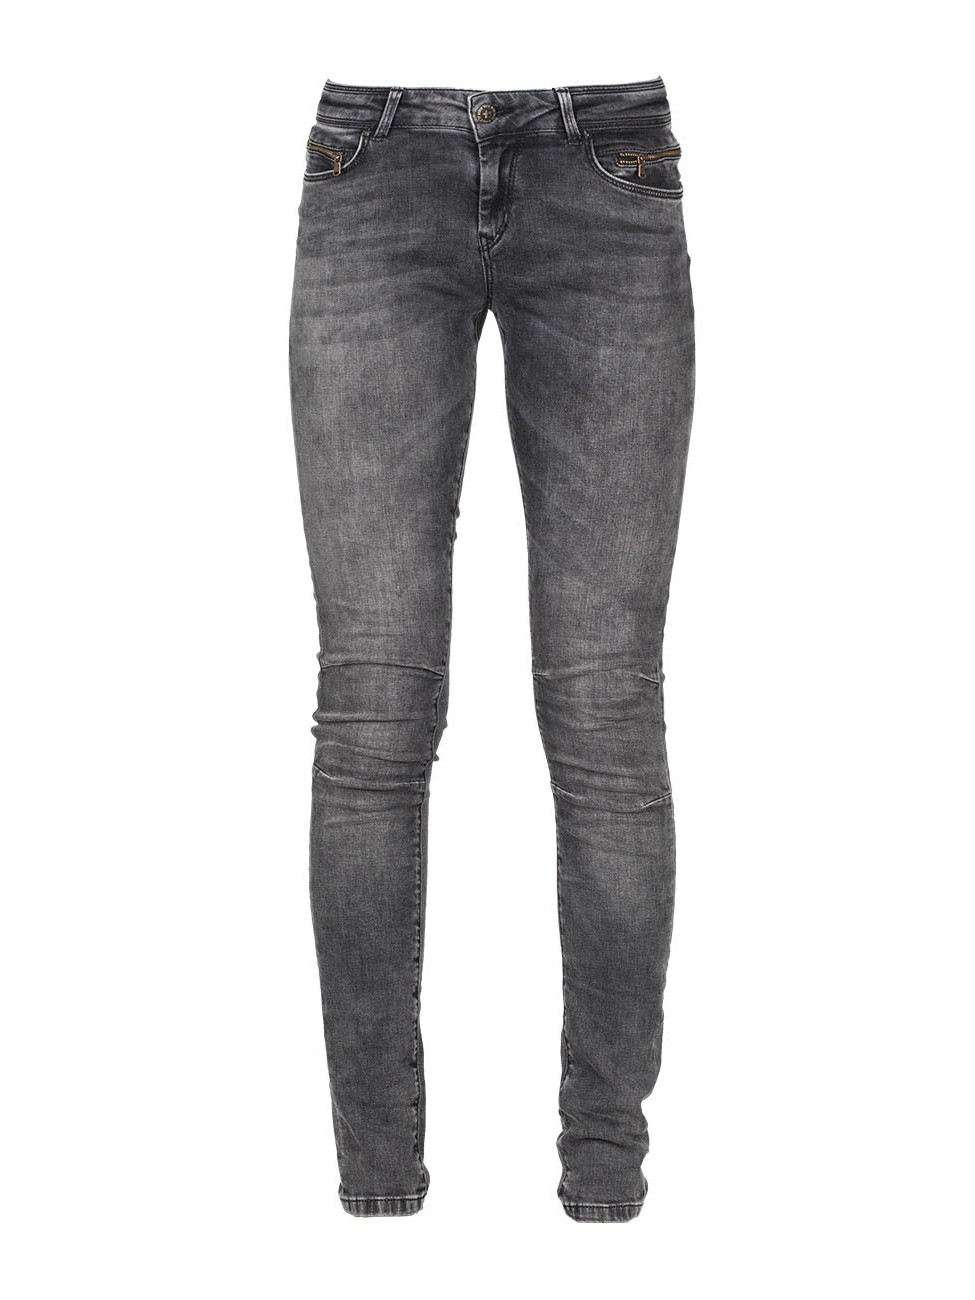 MOD Damen Jeans Eva - Slim Fit - Grau - Middle Grey ...